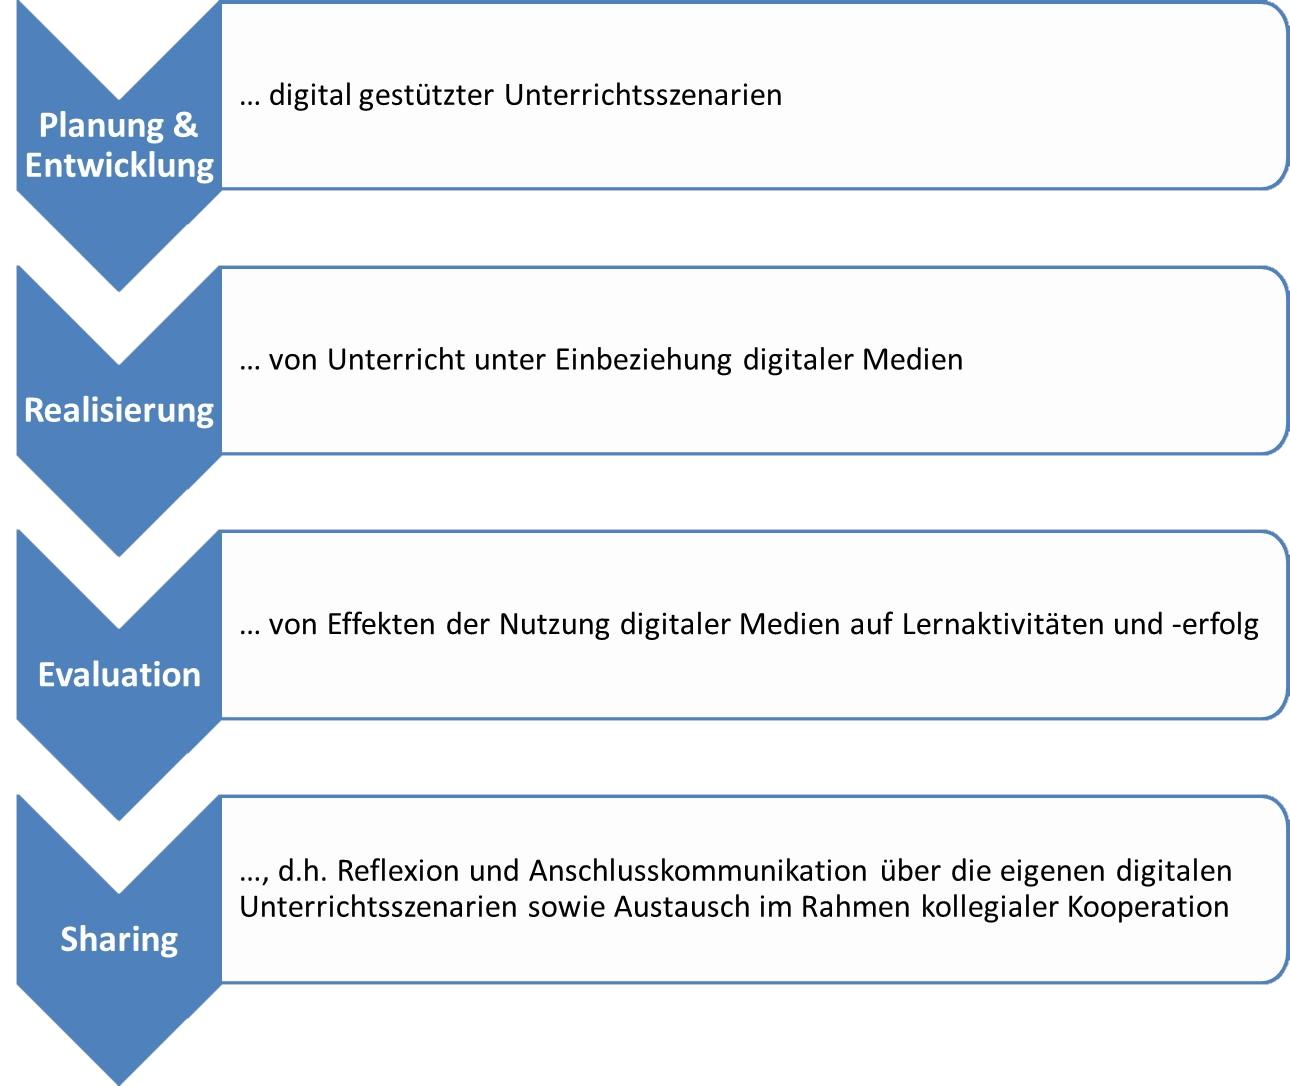 Unterrichtliche Handlungskomponenten medienbezogener Lehrkompetenz (angelehnt an Forschungsgruppe Lehrerbildung Digitaler Campus Bayern, 2017)